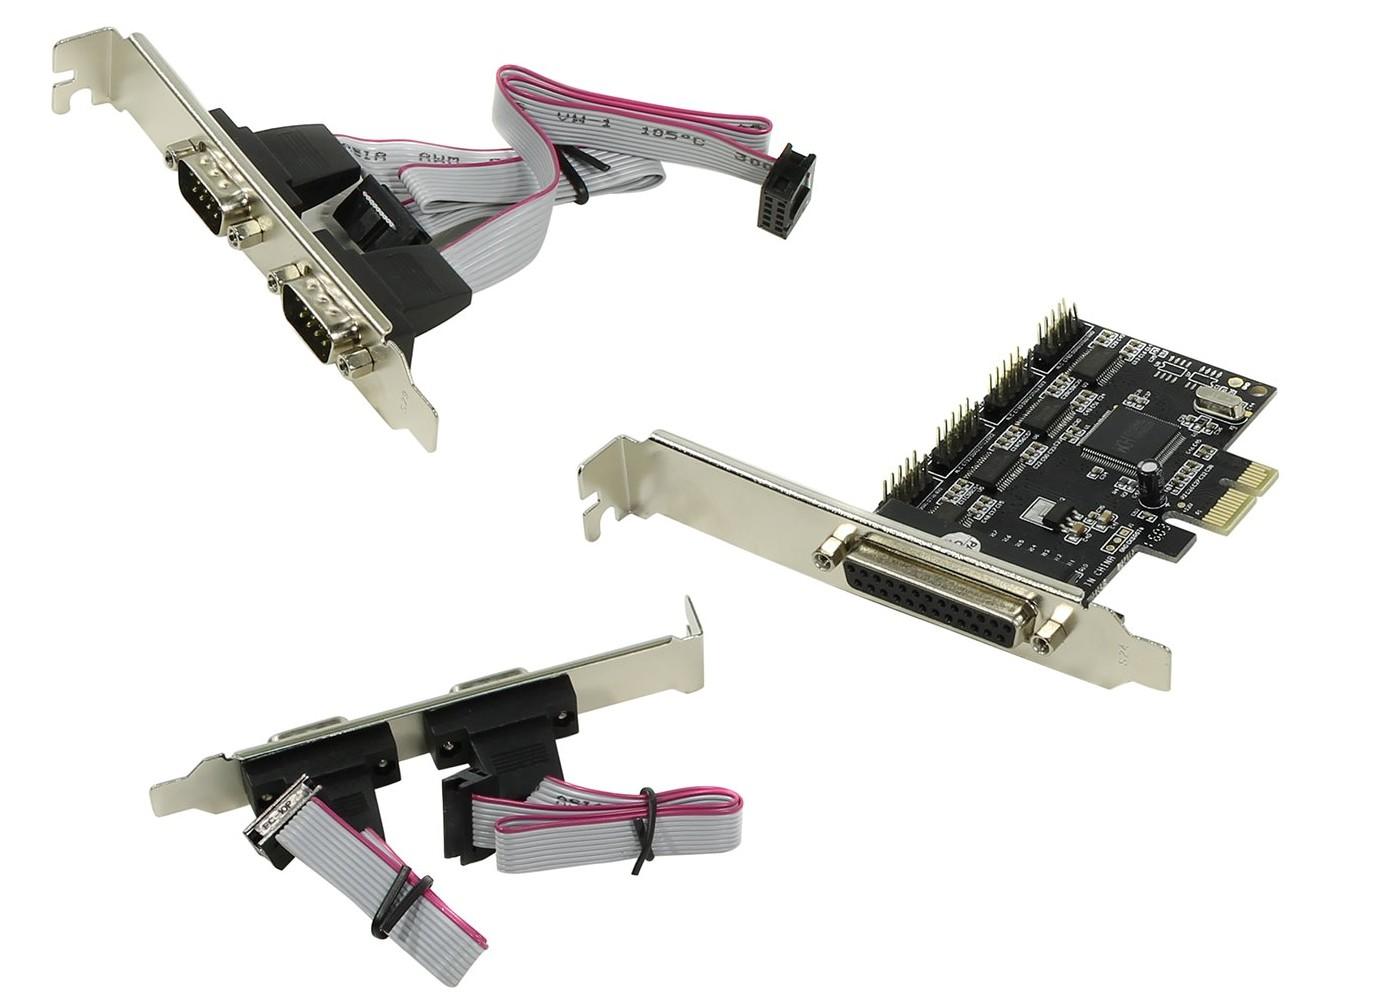 Контроллер ORIENT XWT-PE4S1PV2, PCI-E to COM 4-port + LPT 1-port (WCH CH384) ret контроллер orient xwt pe2slp pci e to com 2 port wch ch382 low profile oem